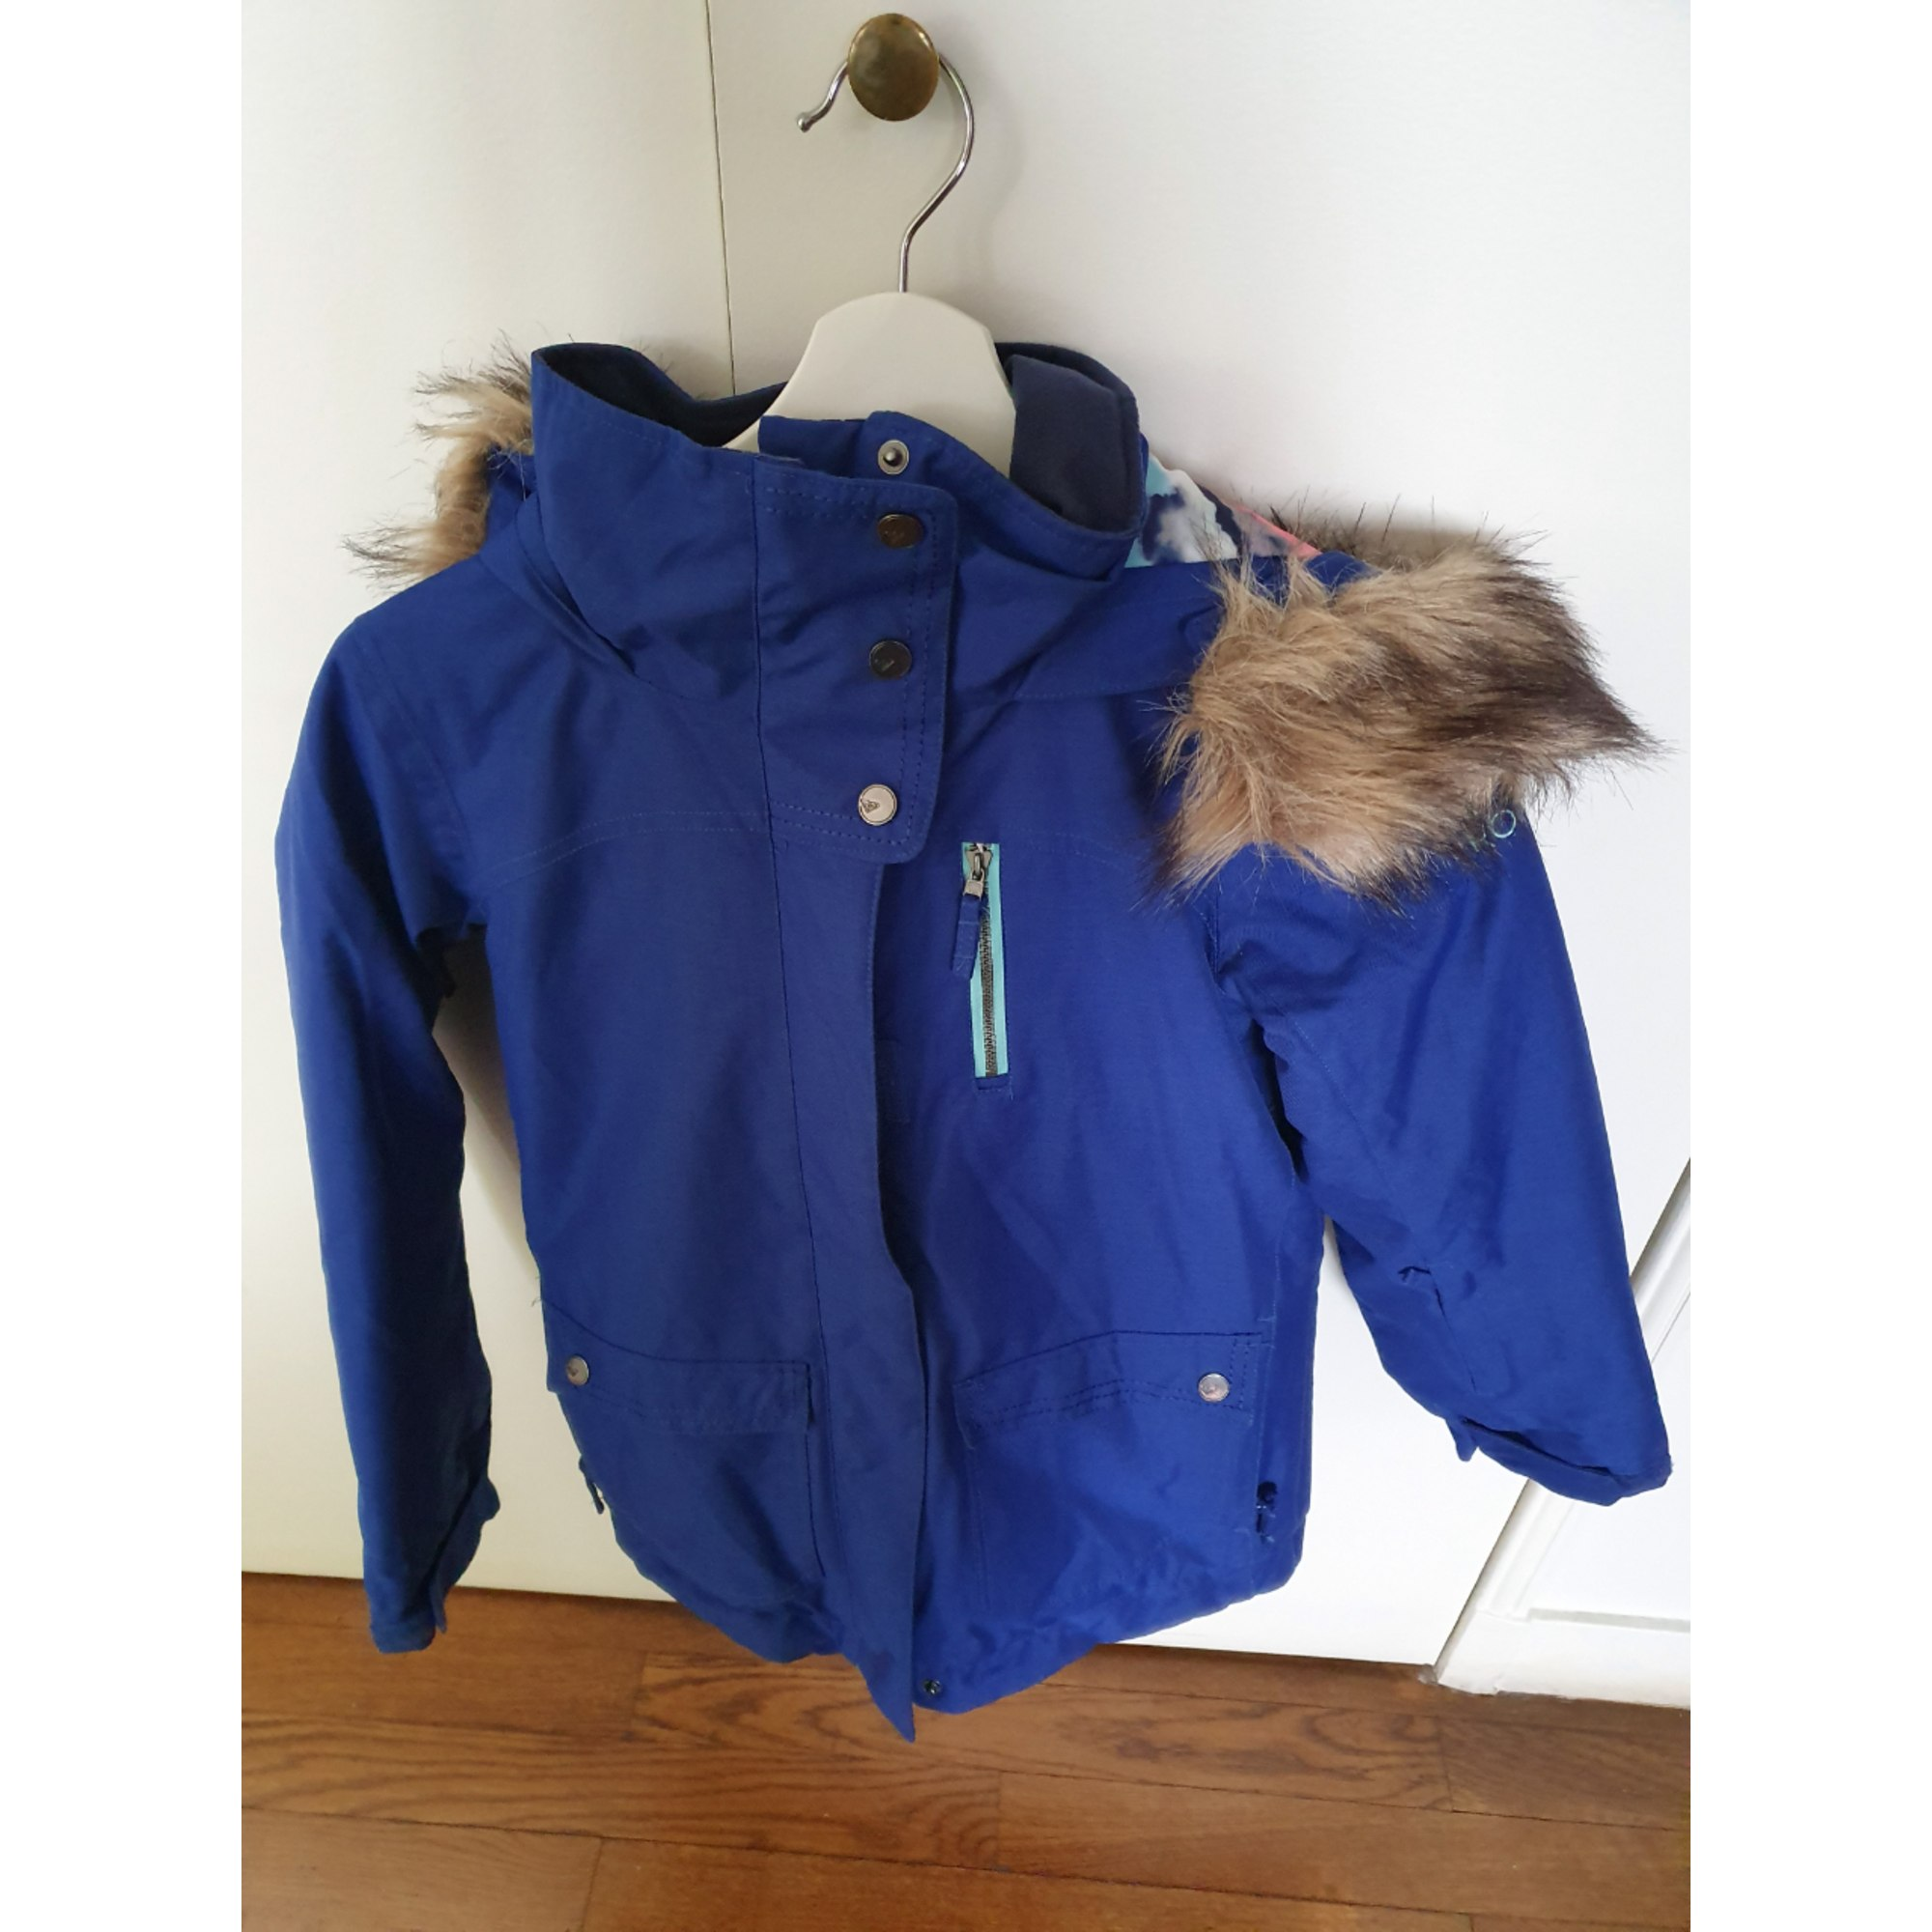 Blouson de ski ROXY Bleu, bleu marine, bleu turquoise